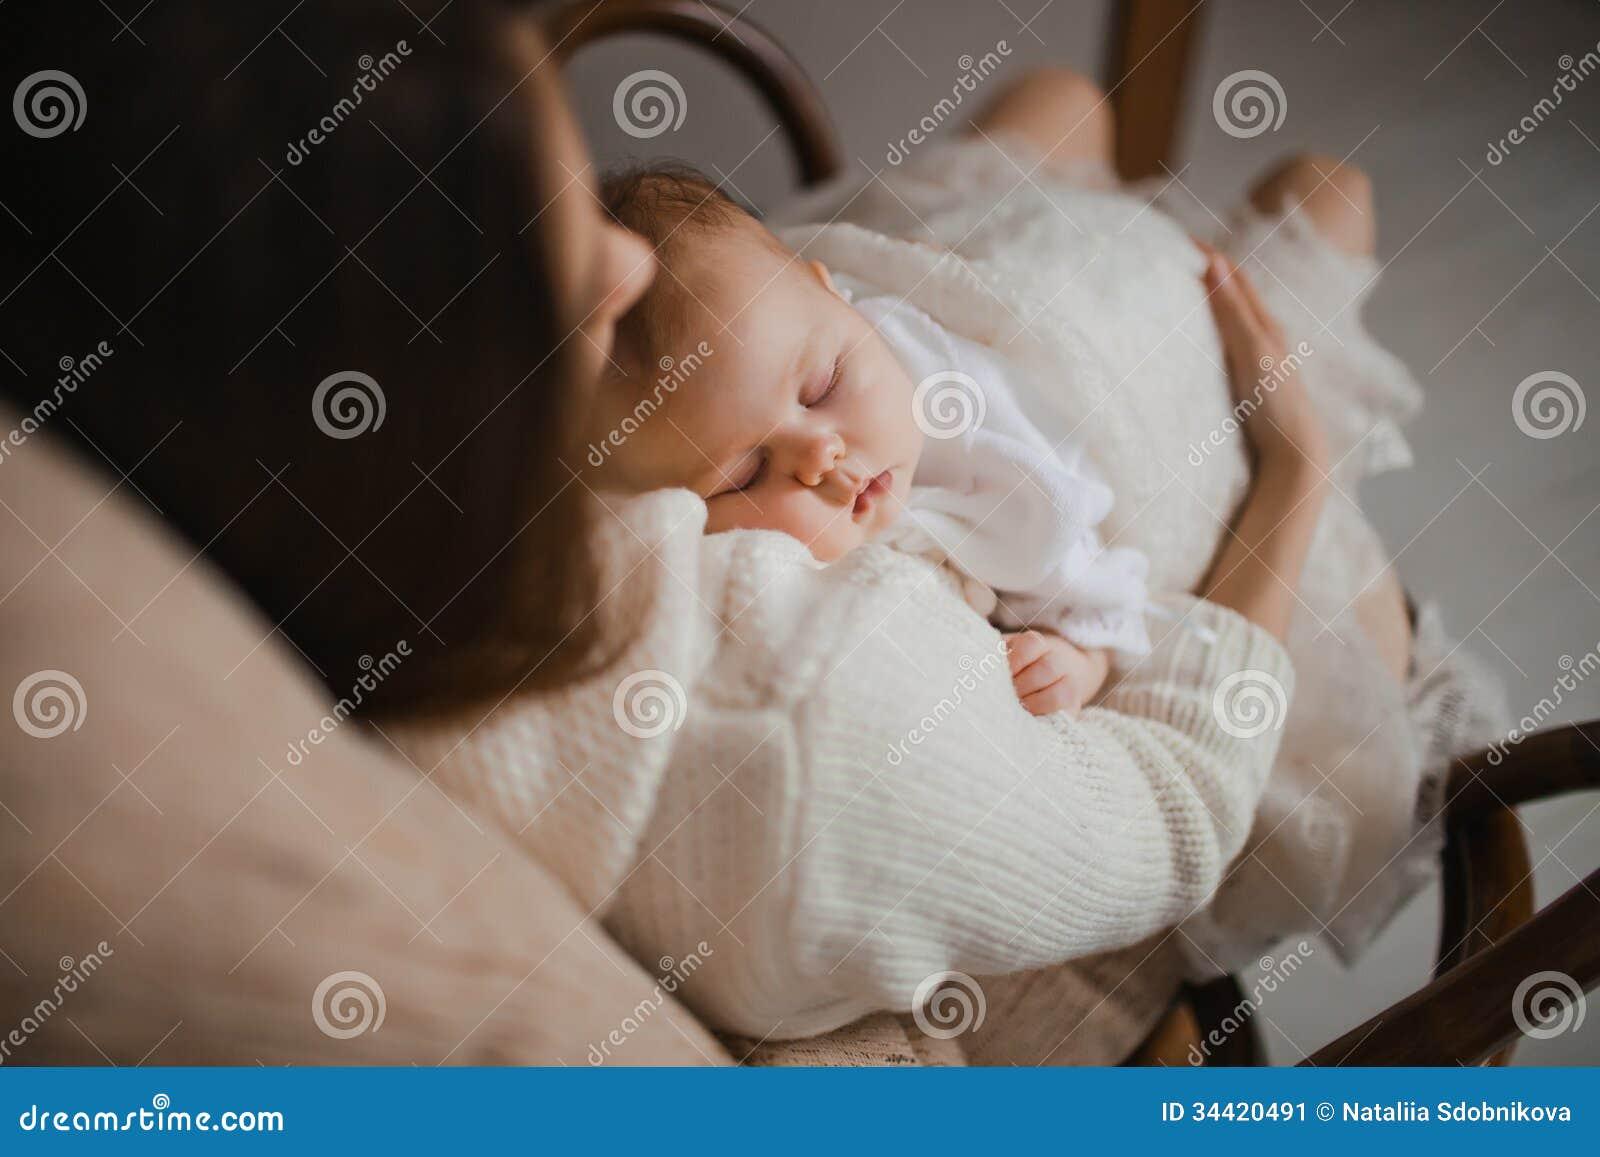 Спящая мать фото 20 фотография